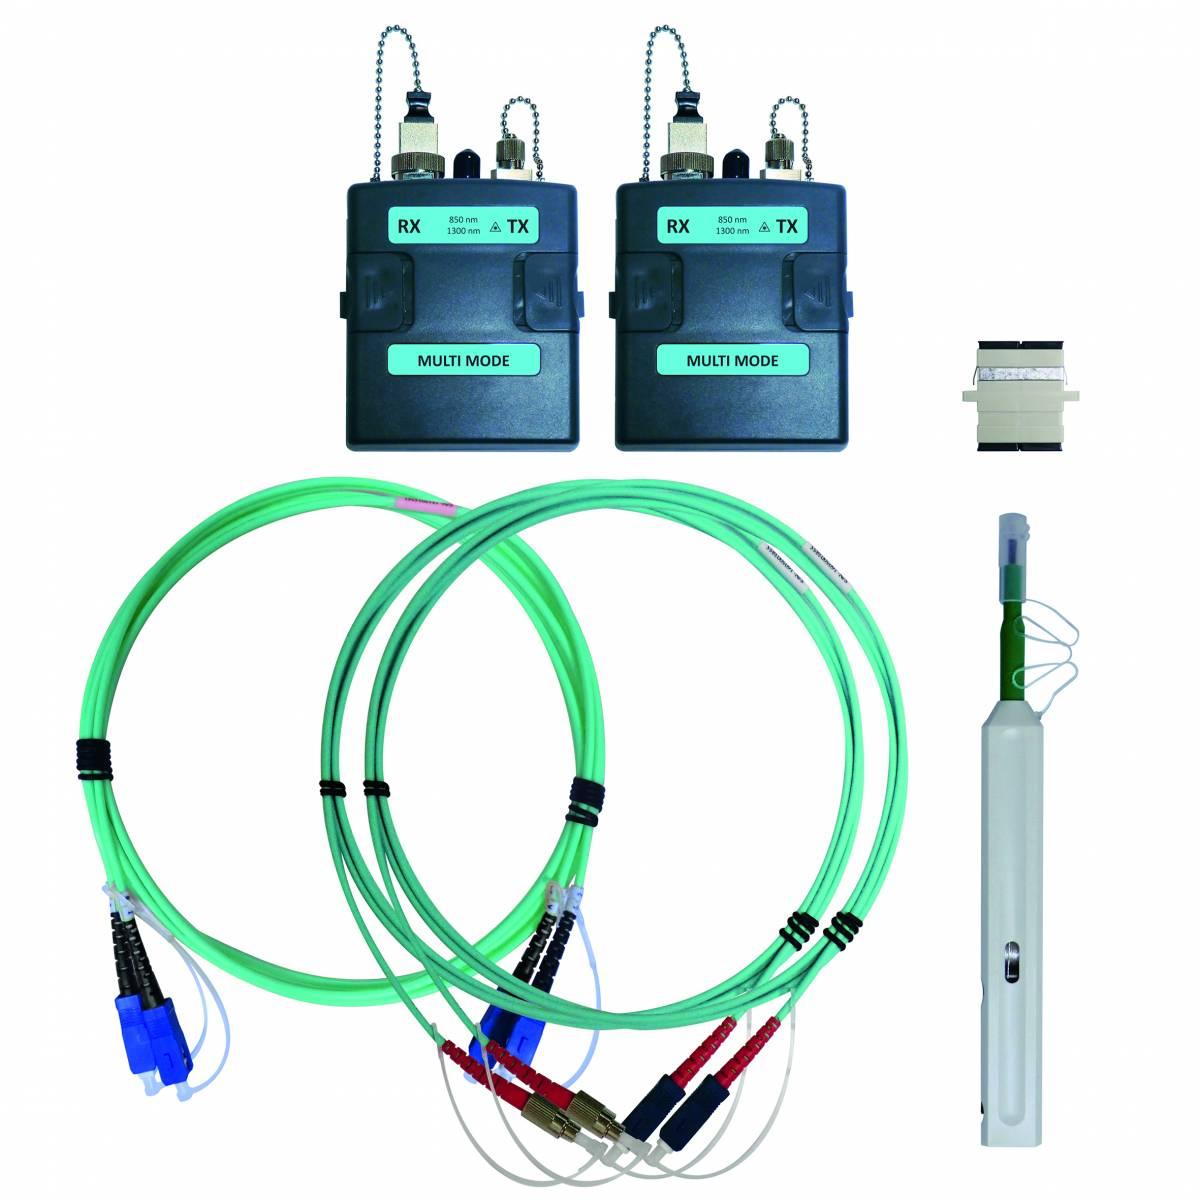 WireXpert - Multimode fiber optic measurement module set